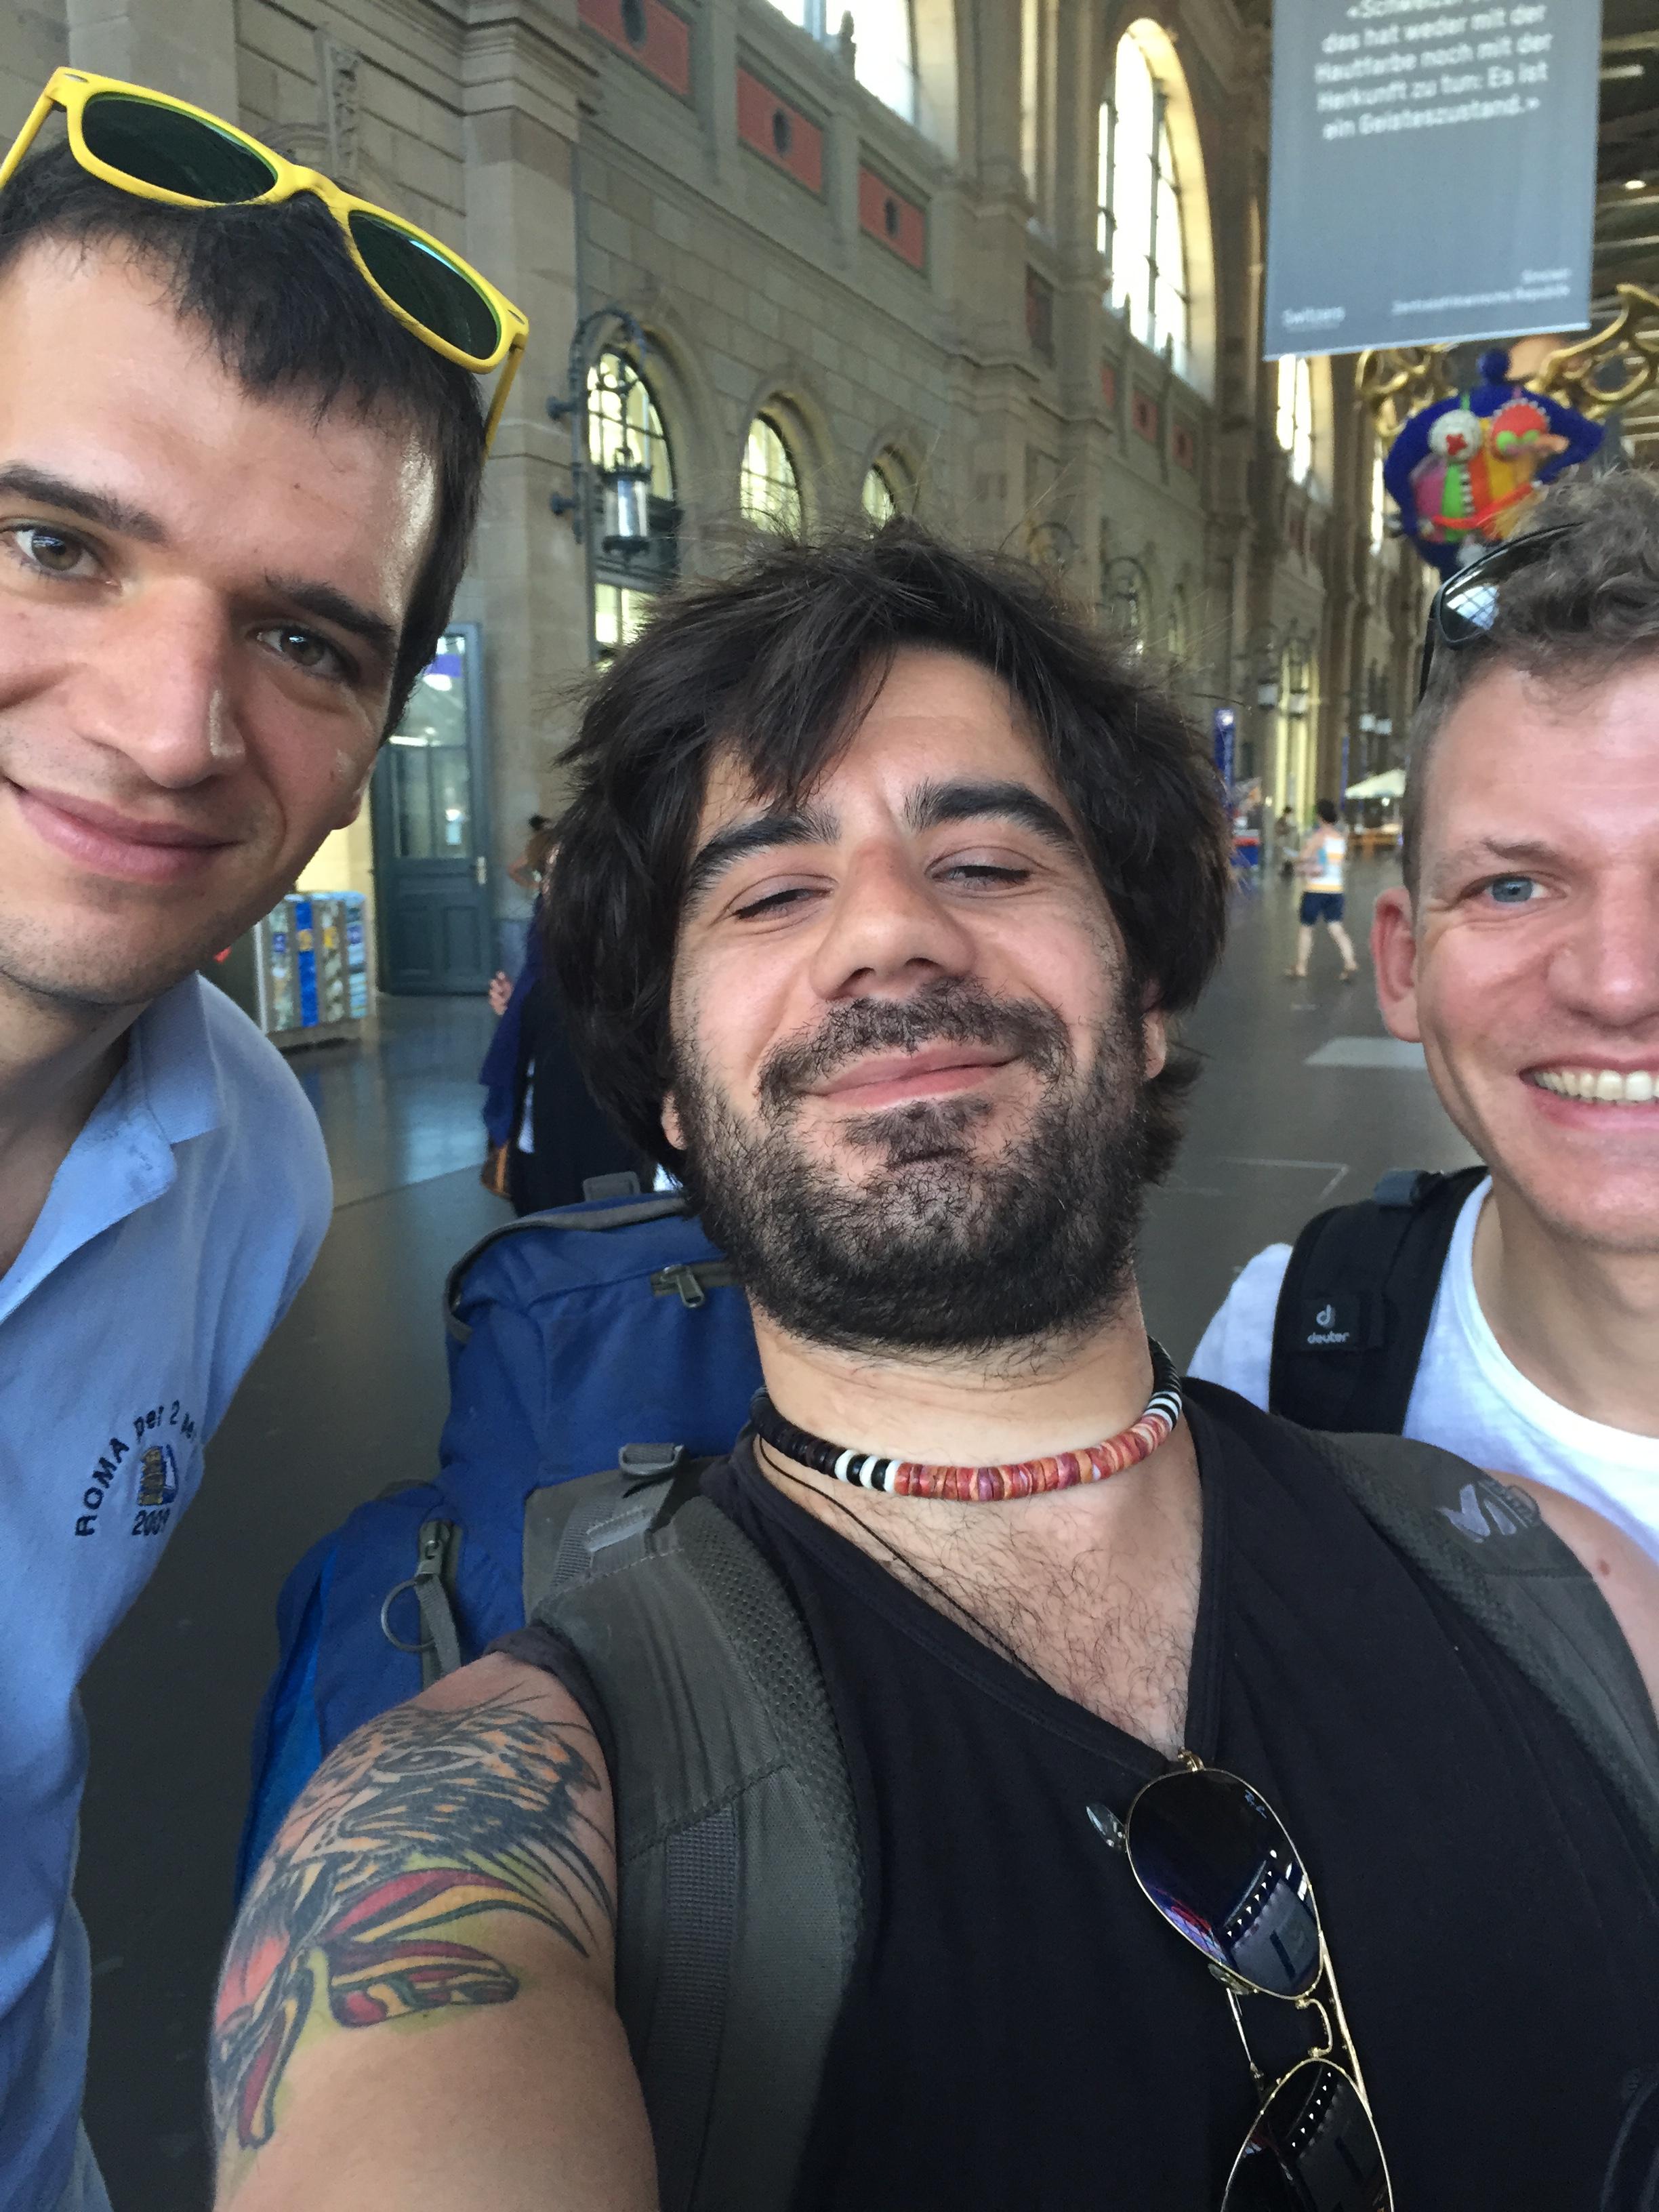 Svizzera - 1 - Stefano, me & Roberto